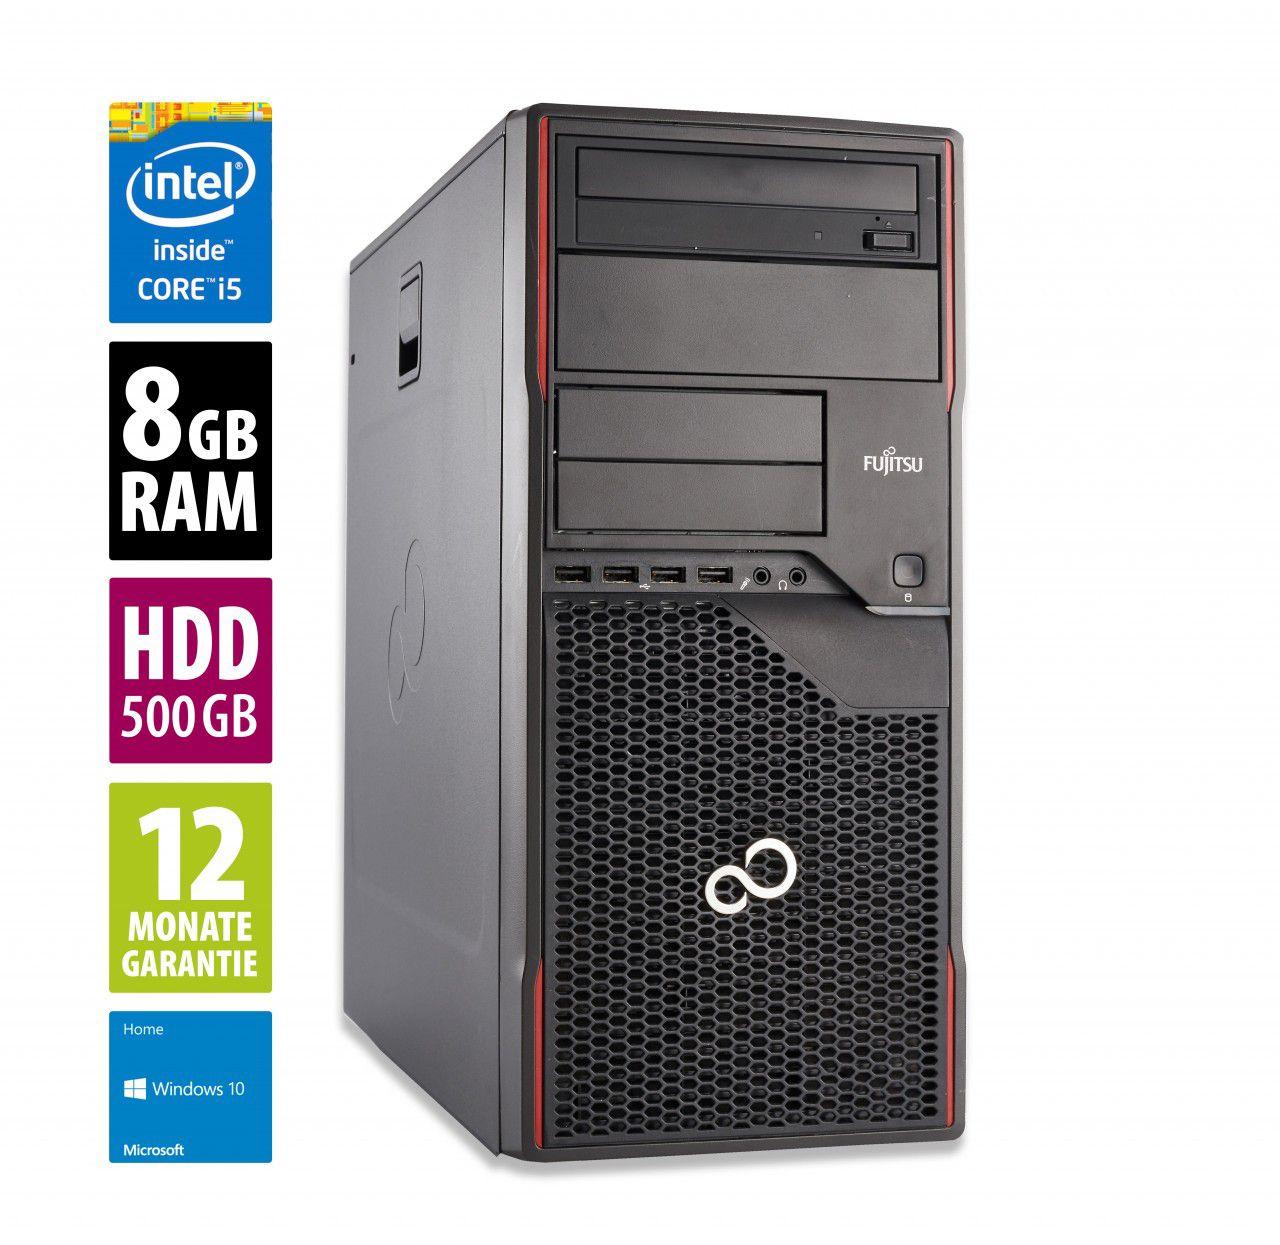 Tour PC Fujitsu Esprimo P700 MT - Core i5-2400 (3,1 GHz), 8 Go RAM, 500 Go HDD, Lecteur DVD-RW, Windows 10 (Reconditionné) - afbshop.de